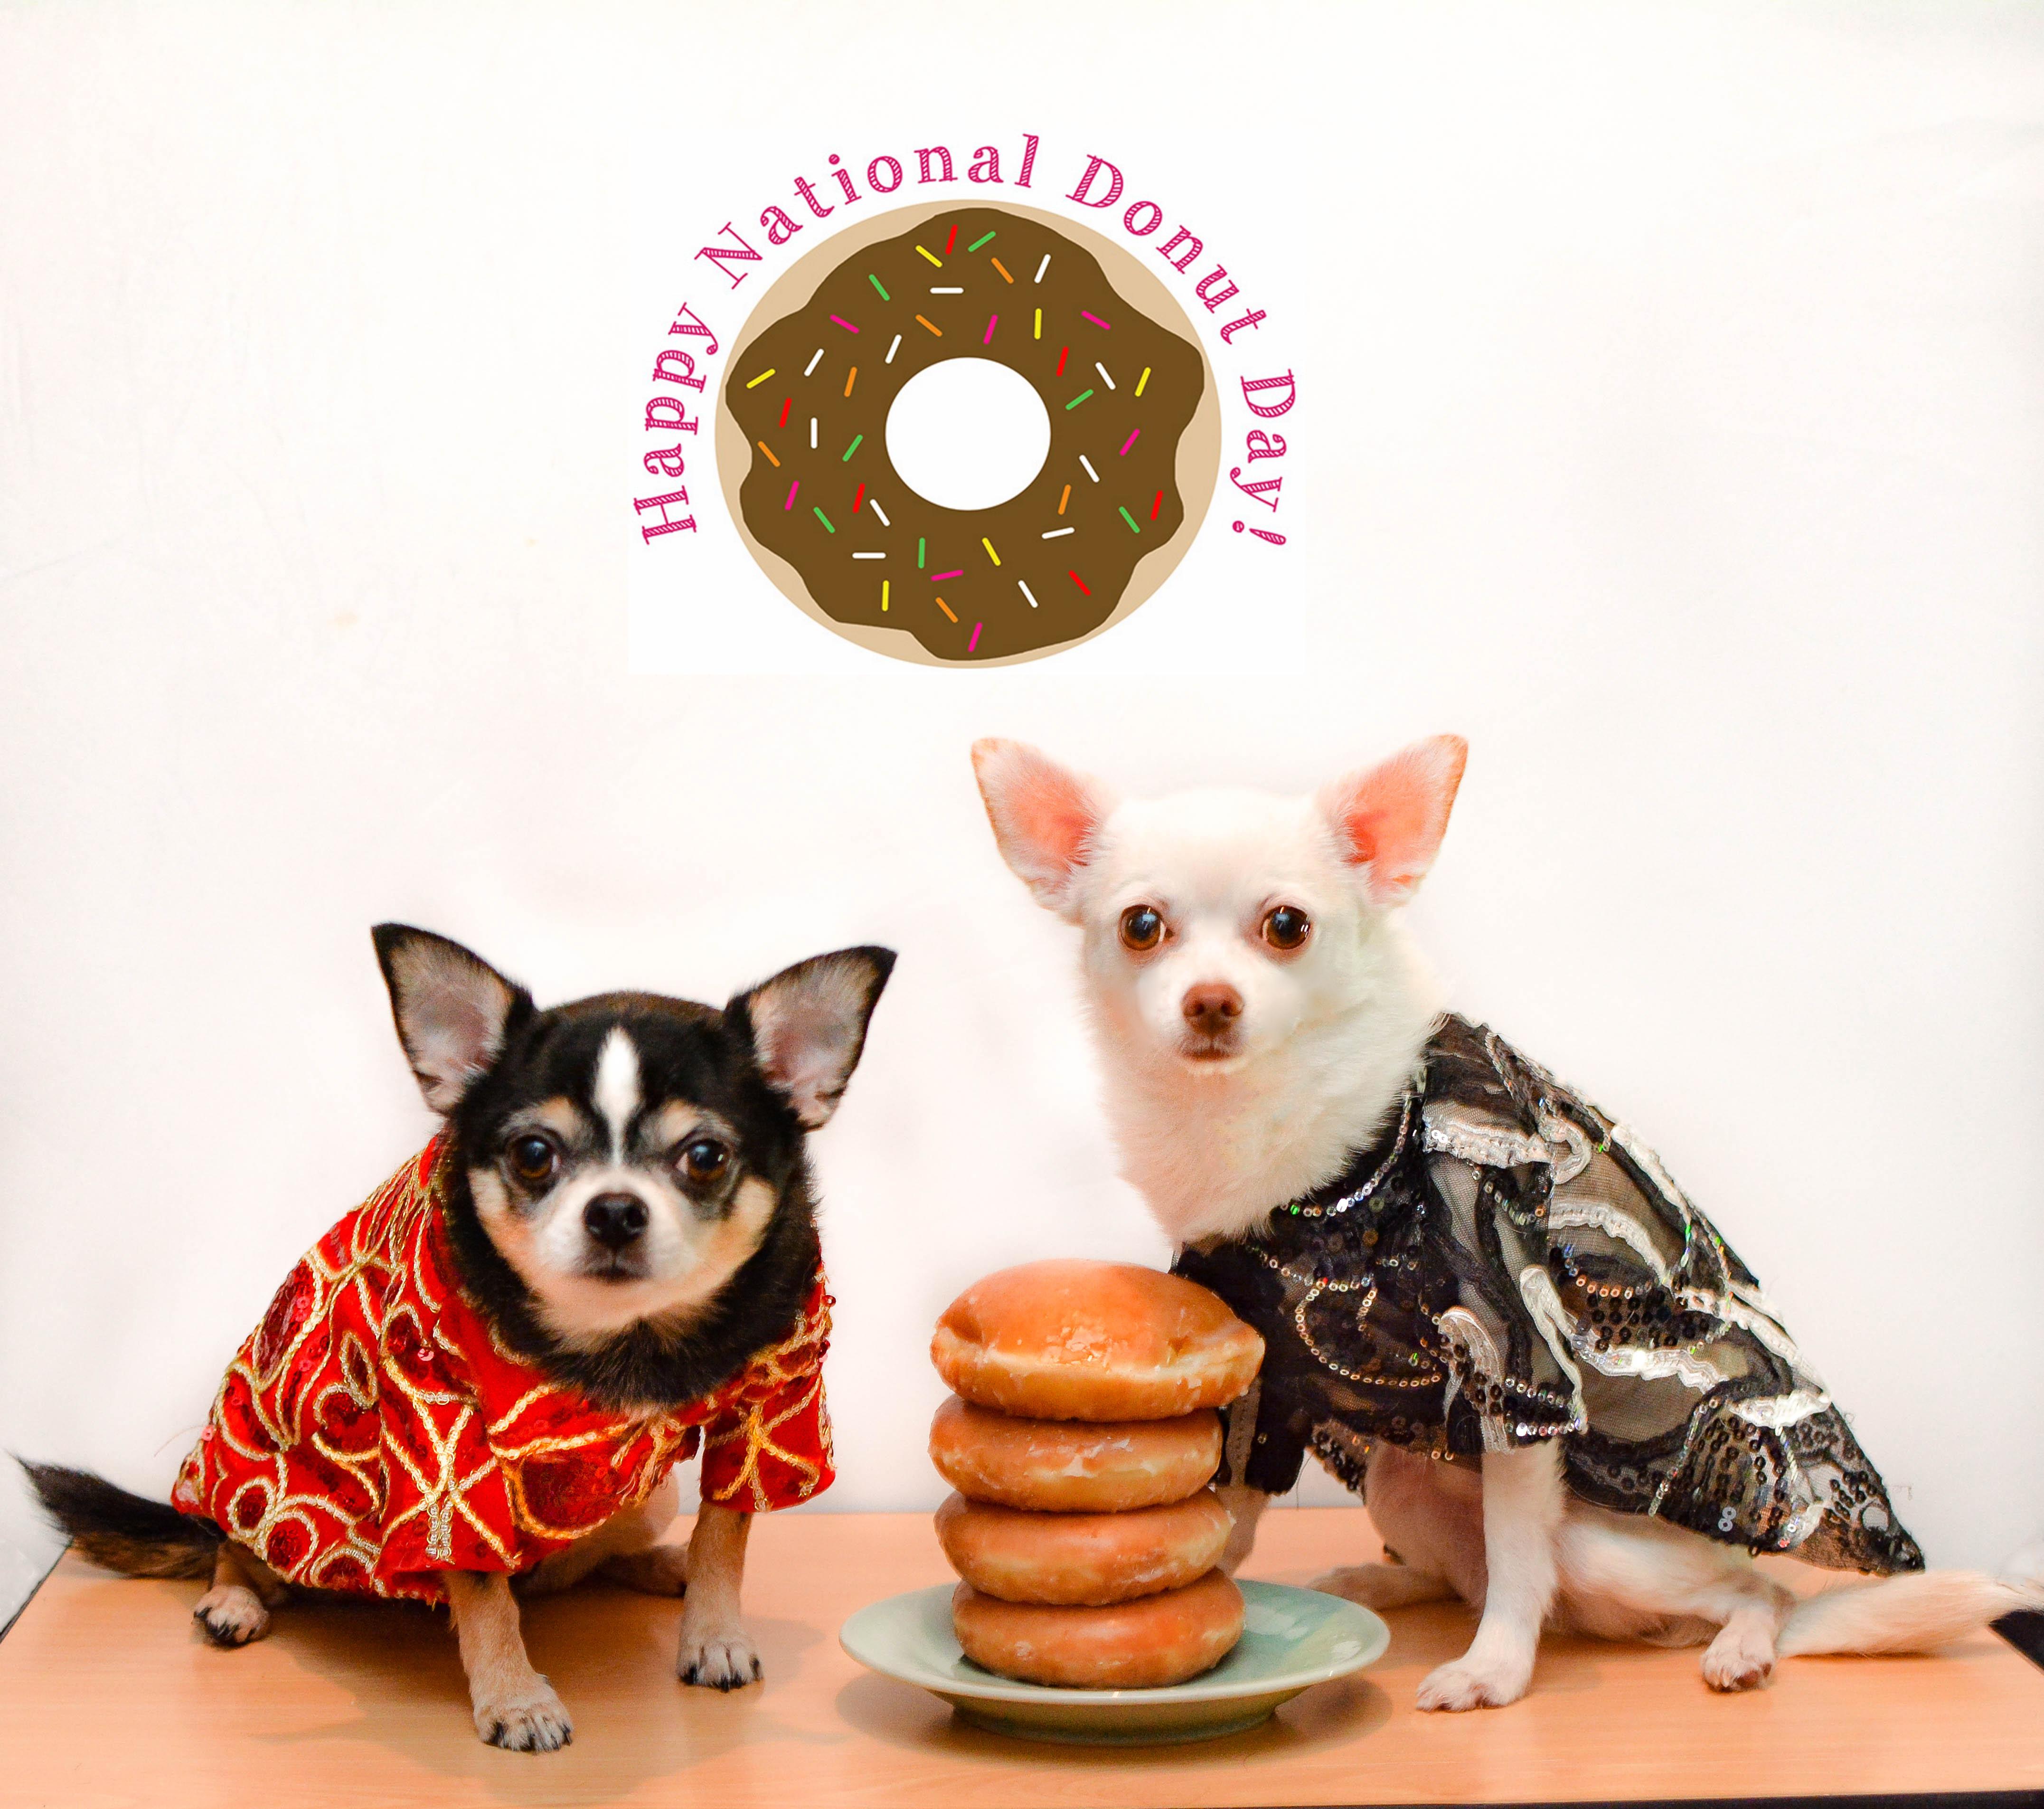 Happy National Donut Day from Anthony Rubio!